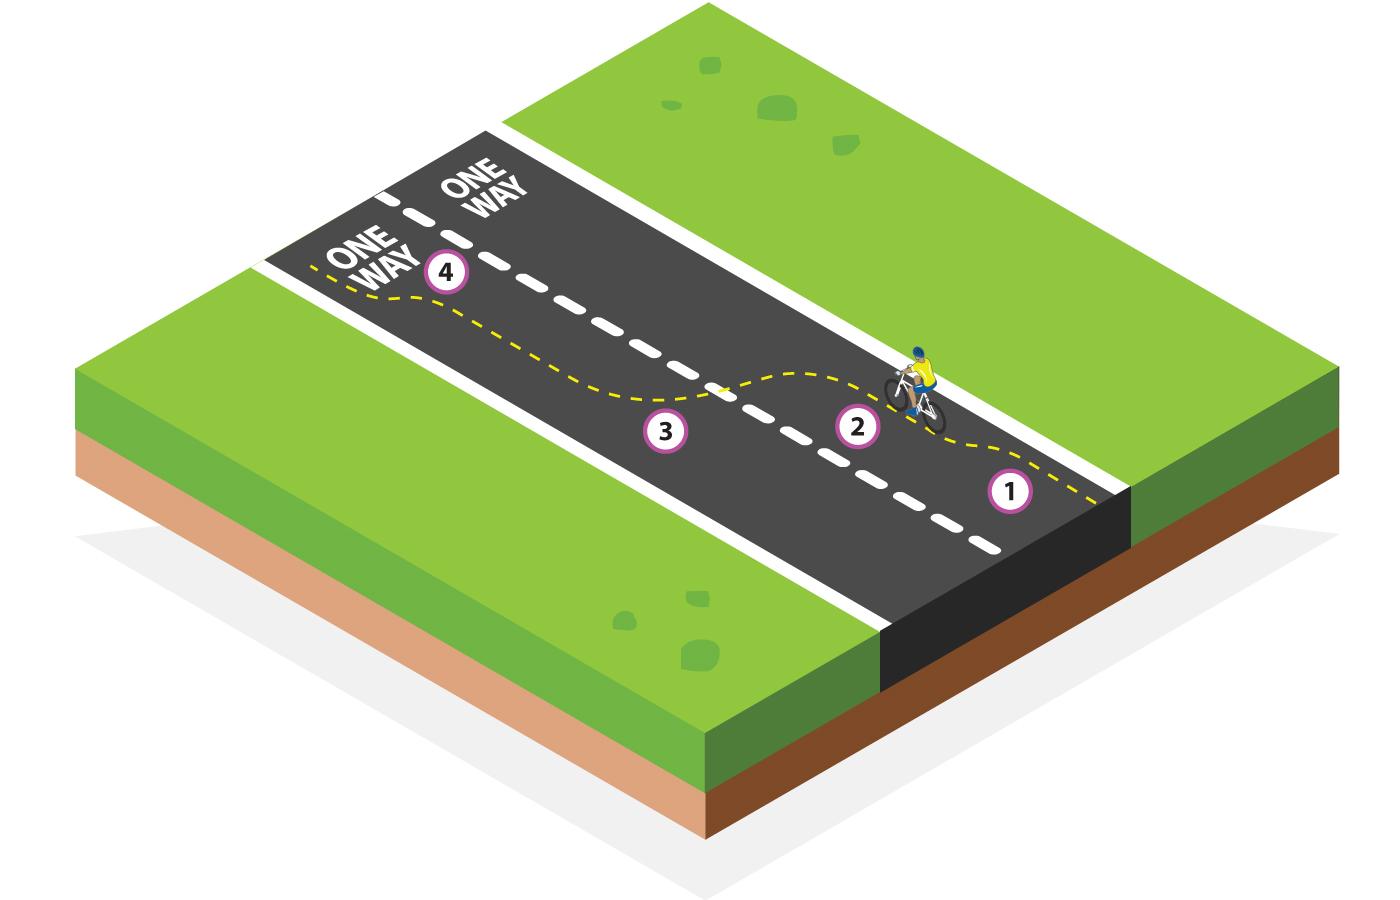 One way change lane